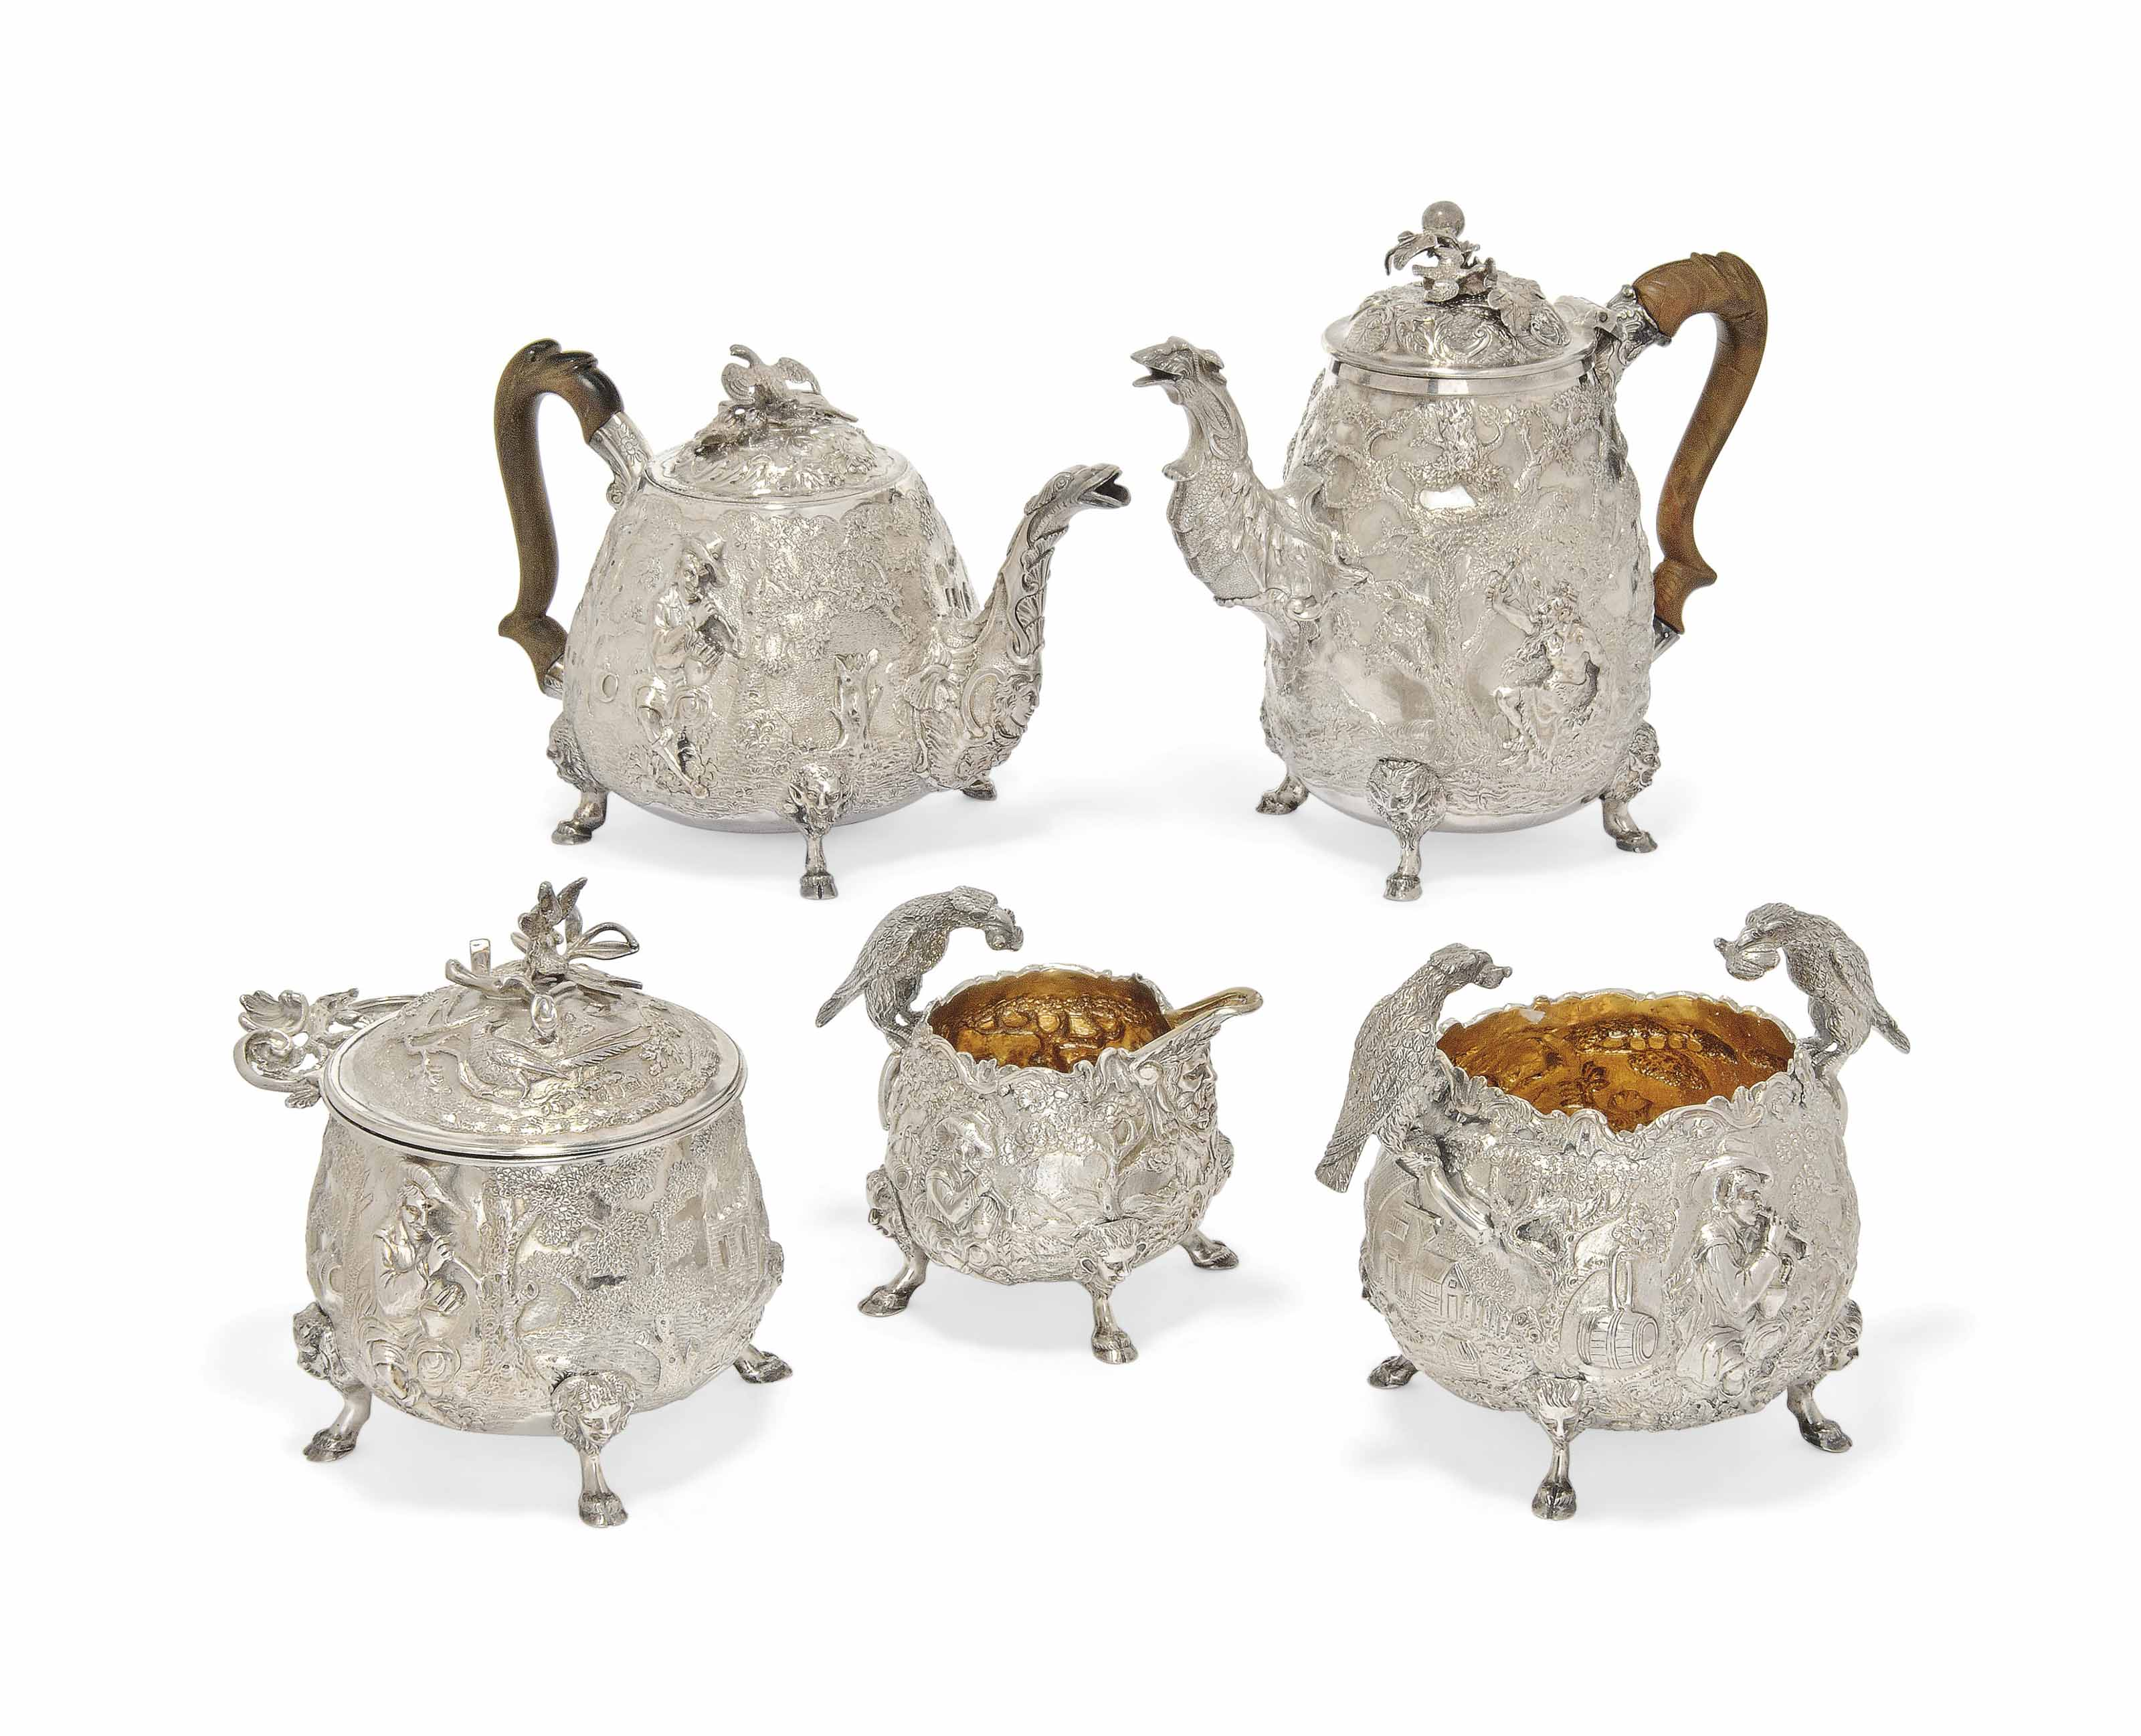 A GEORGE III SILVER FIVE-PIECE TEA AND COFFEE SERVICE